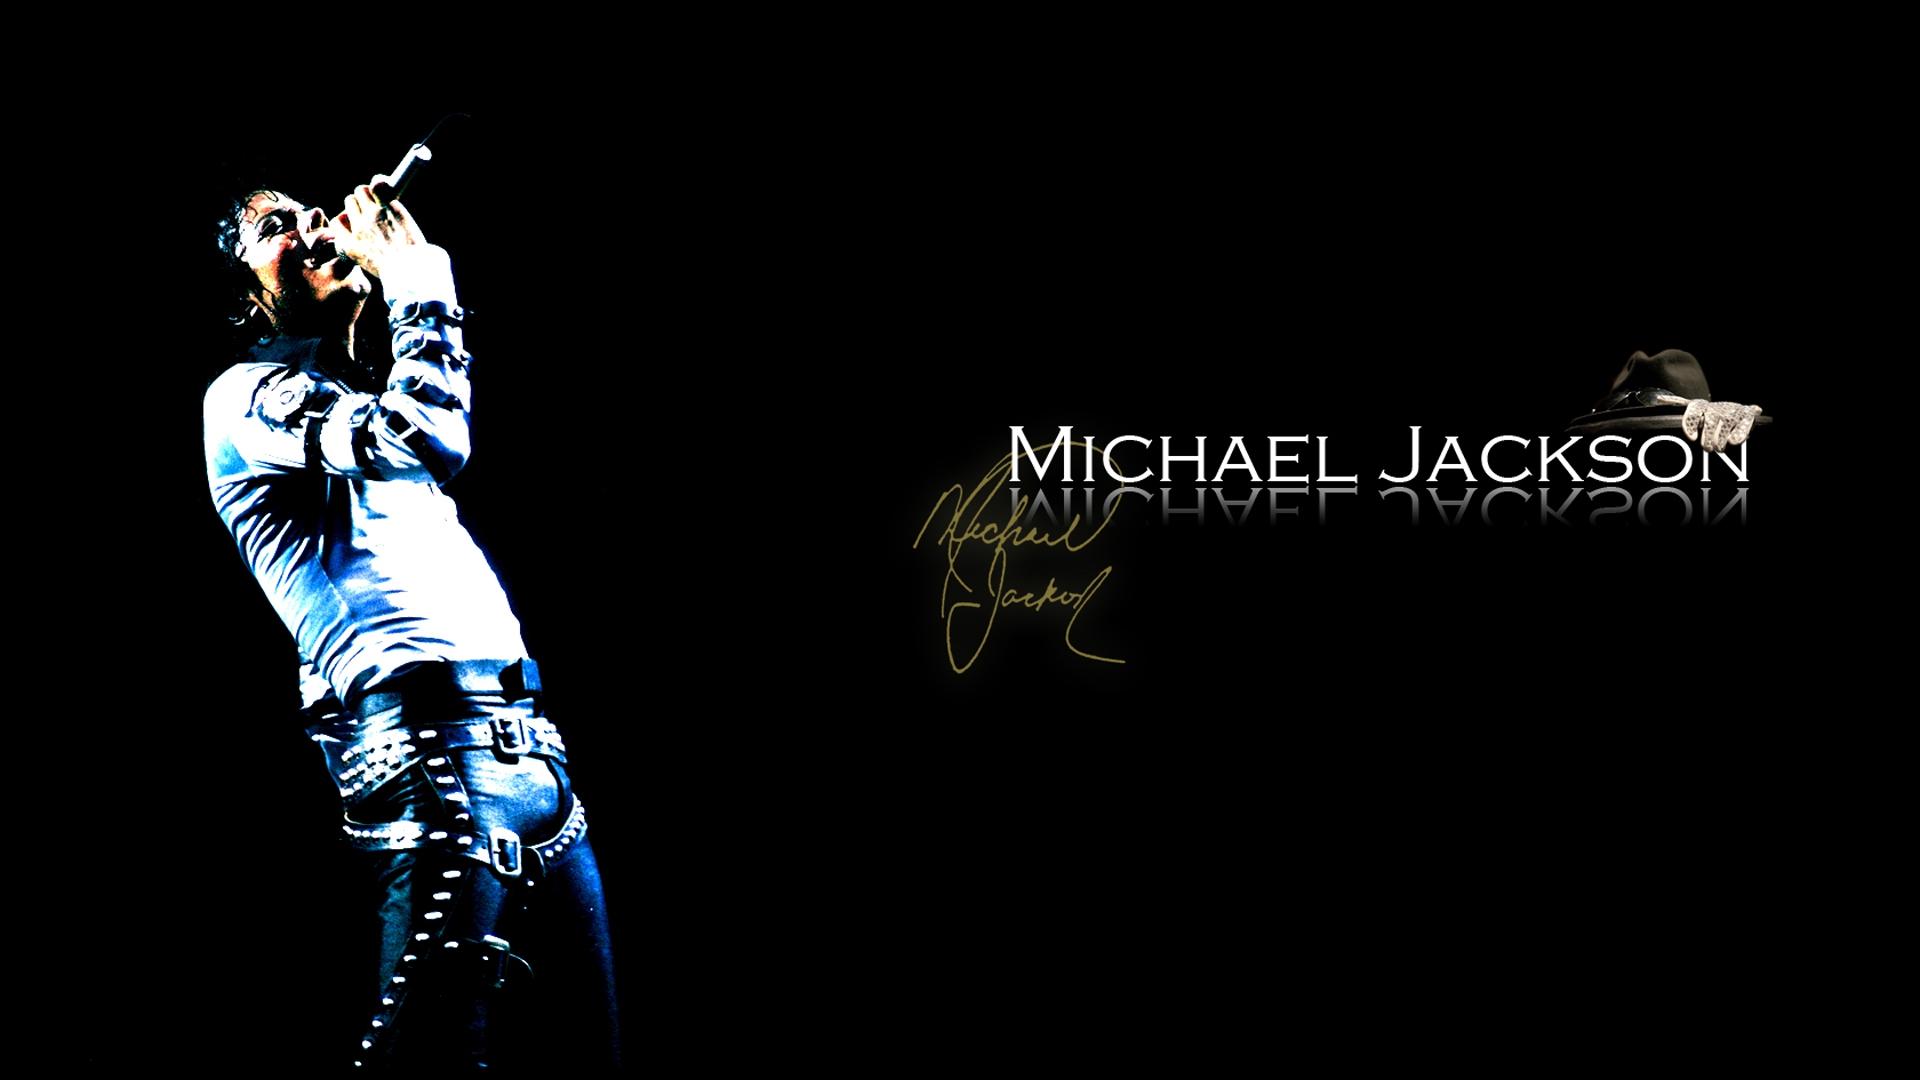 [47+] Michael Jackson Wallpapers for Desktop on ...